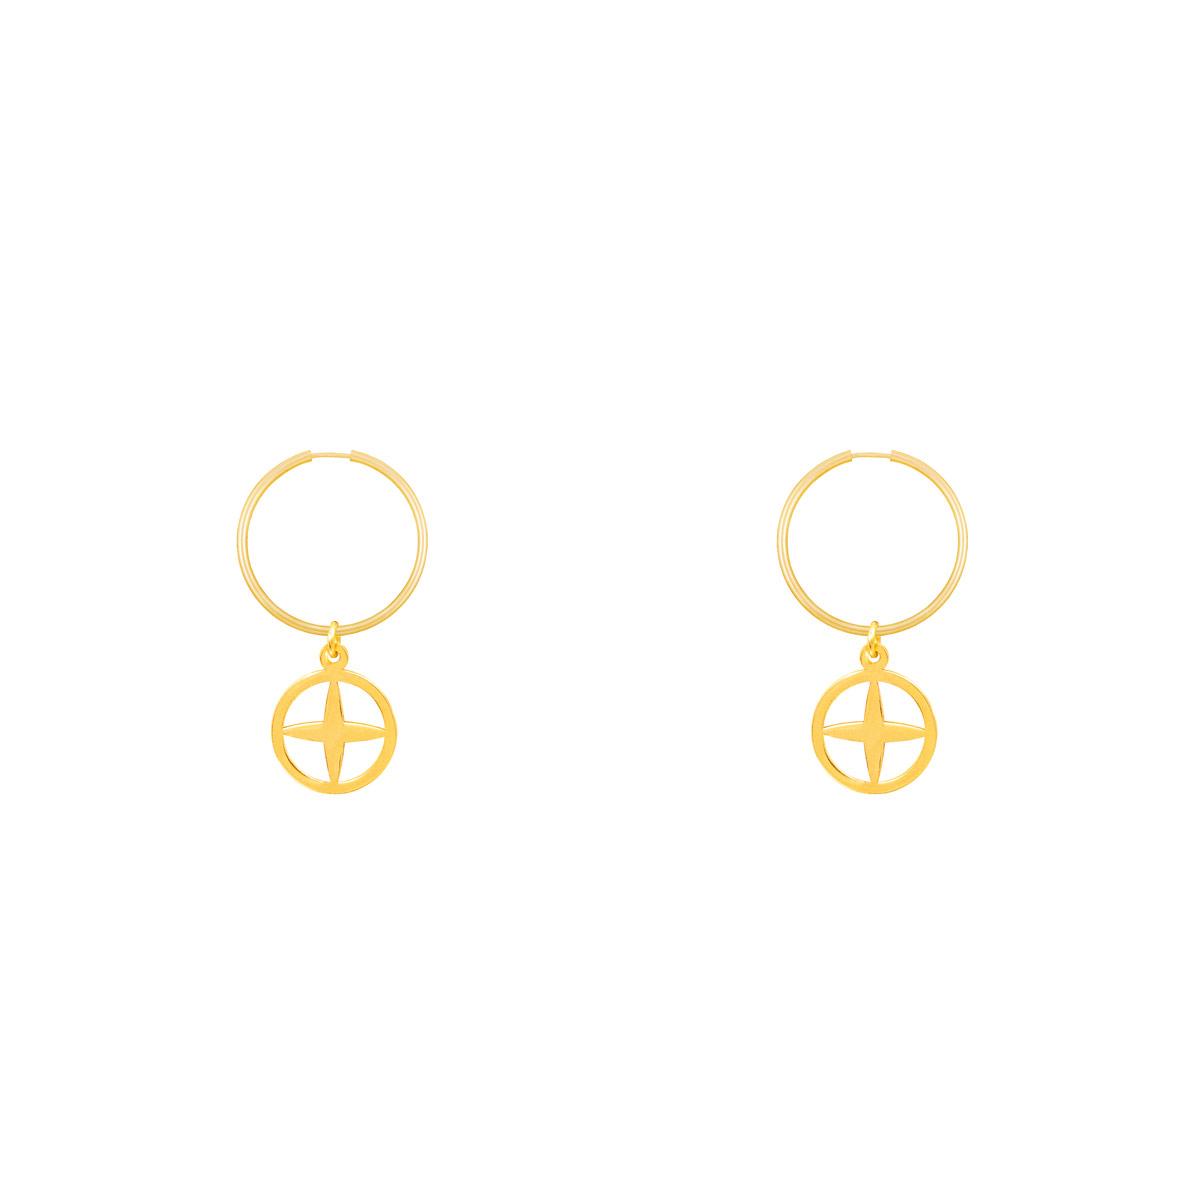 گوشواره طلا حلقه ای آفتاب پرسته